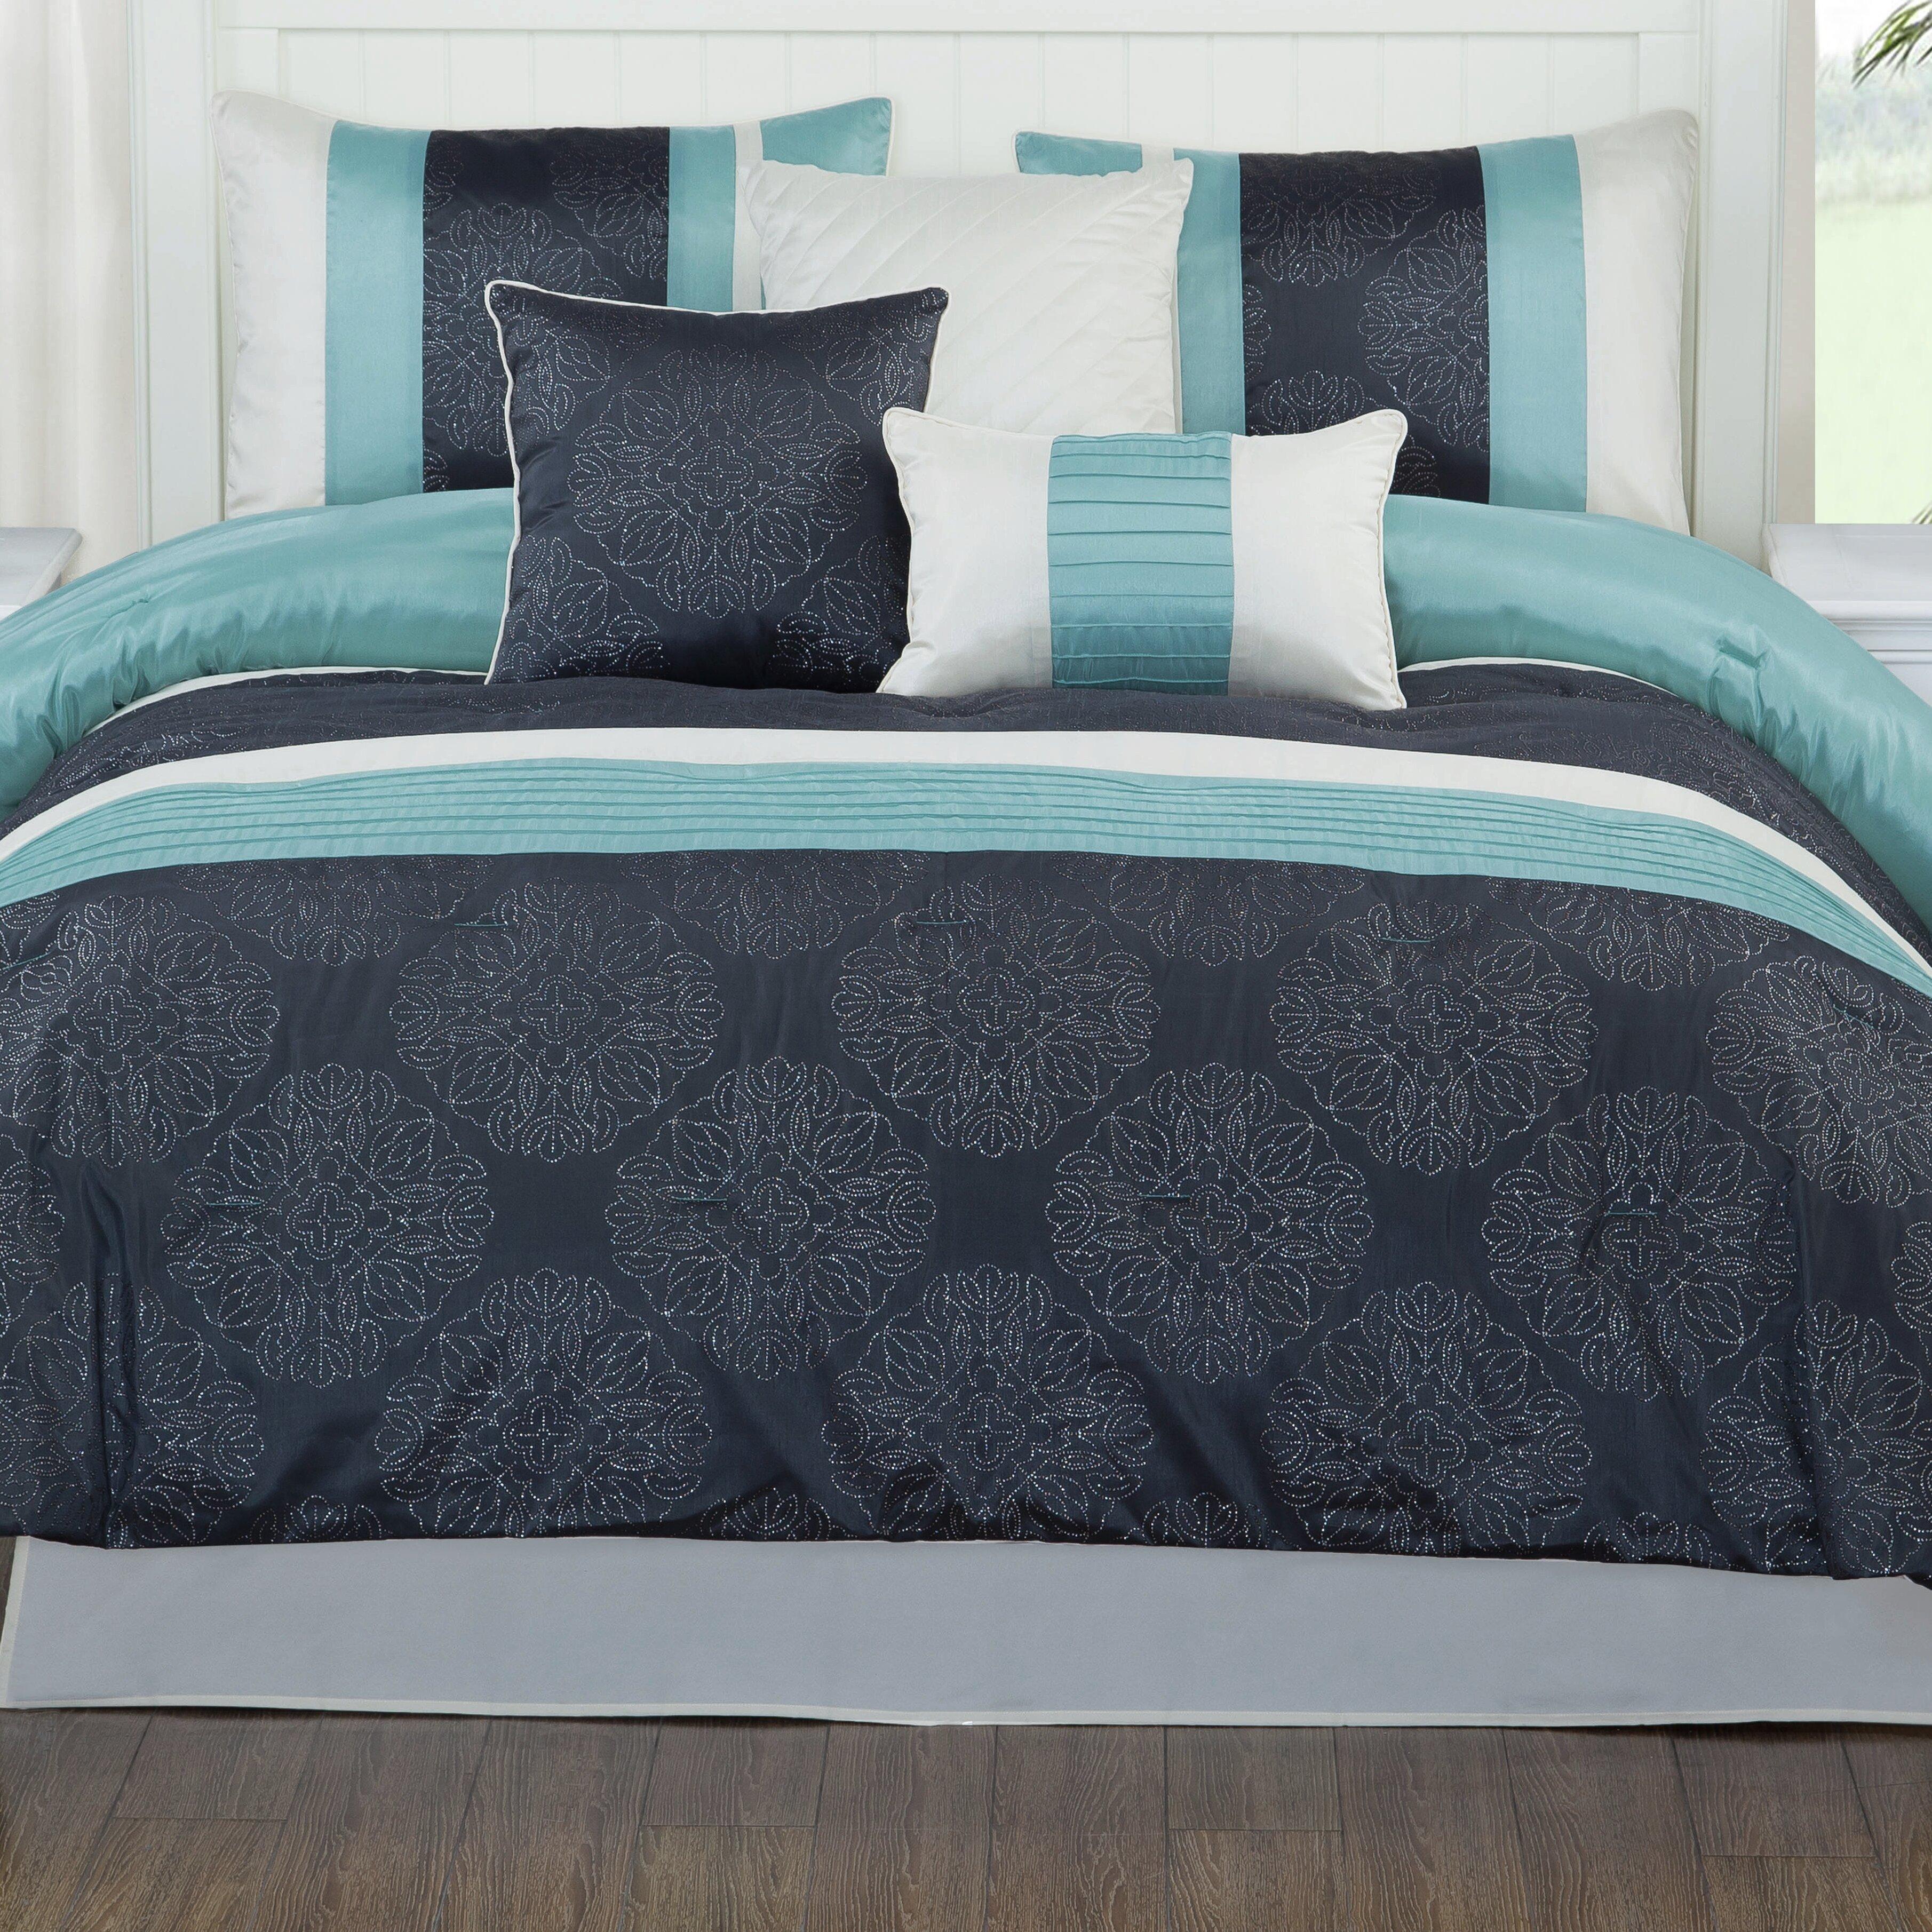 studio17 glorious 7 piece comforter set wayfair